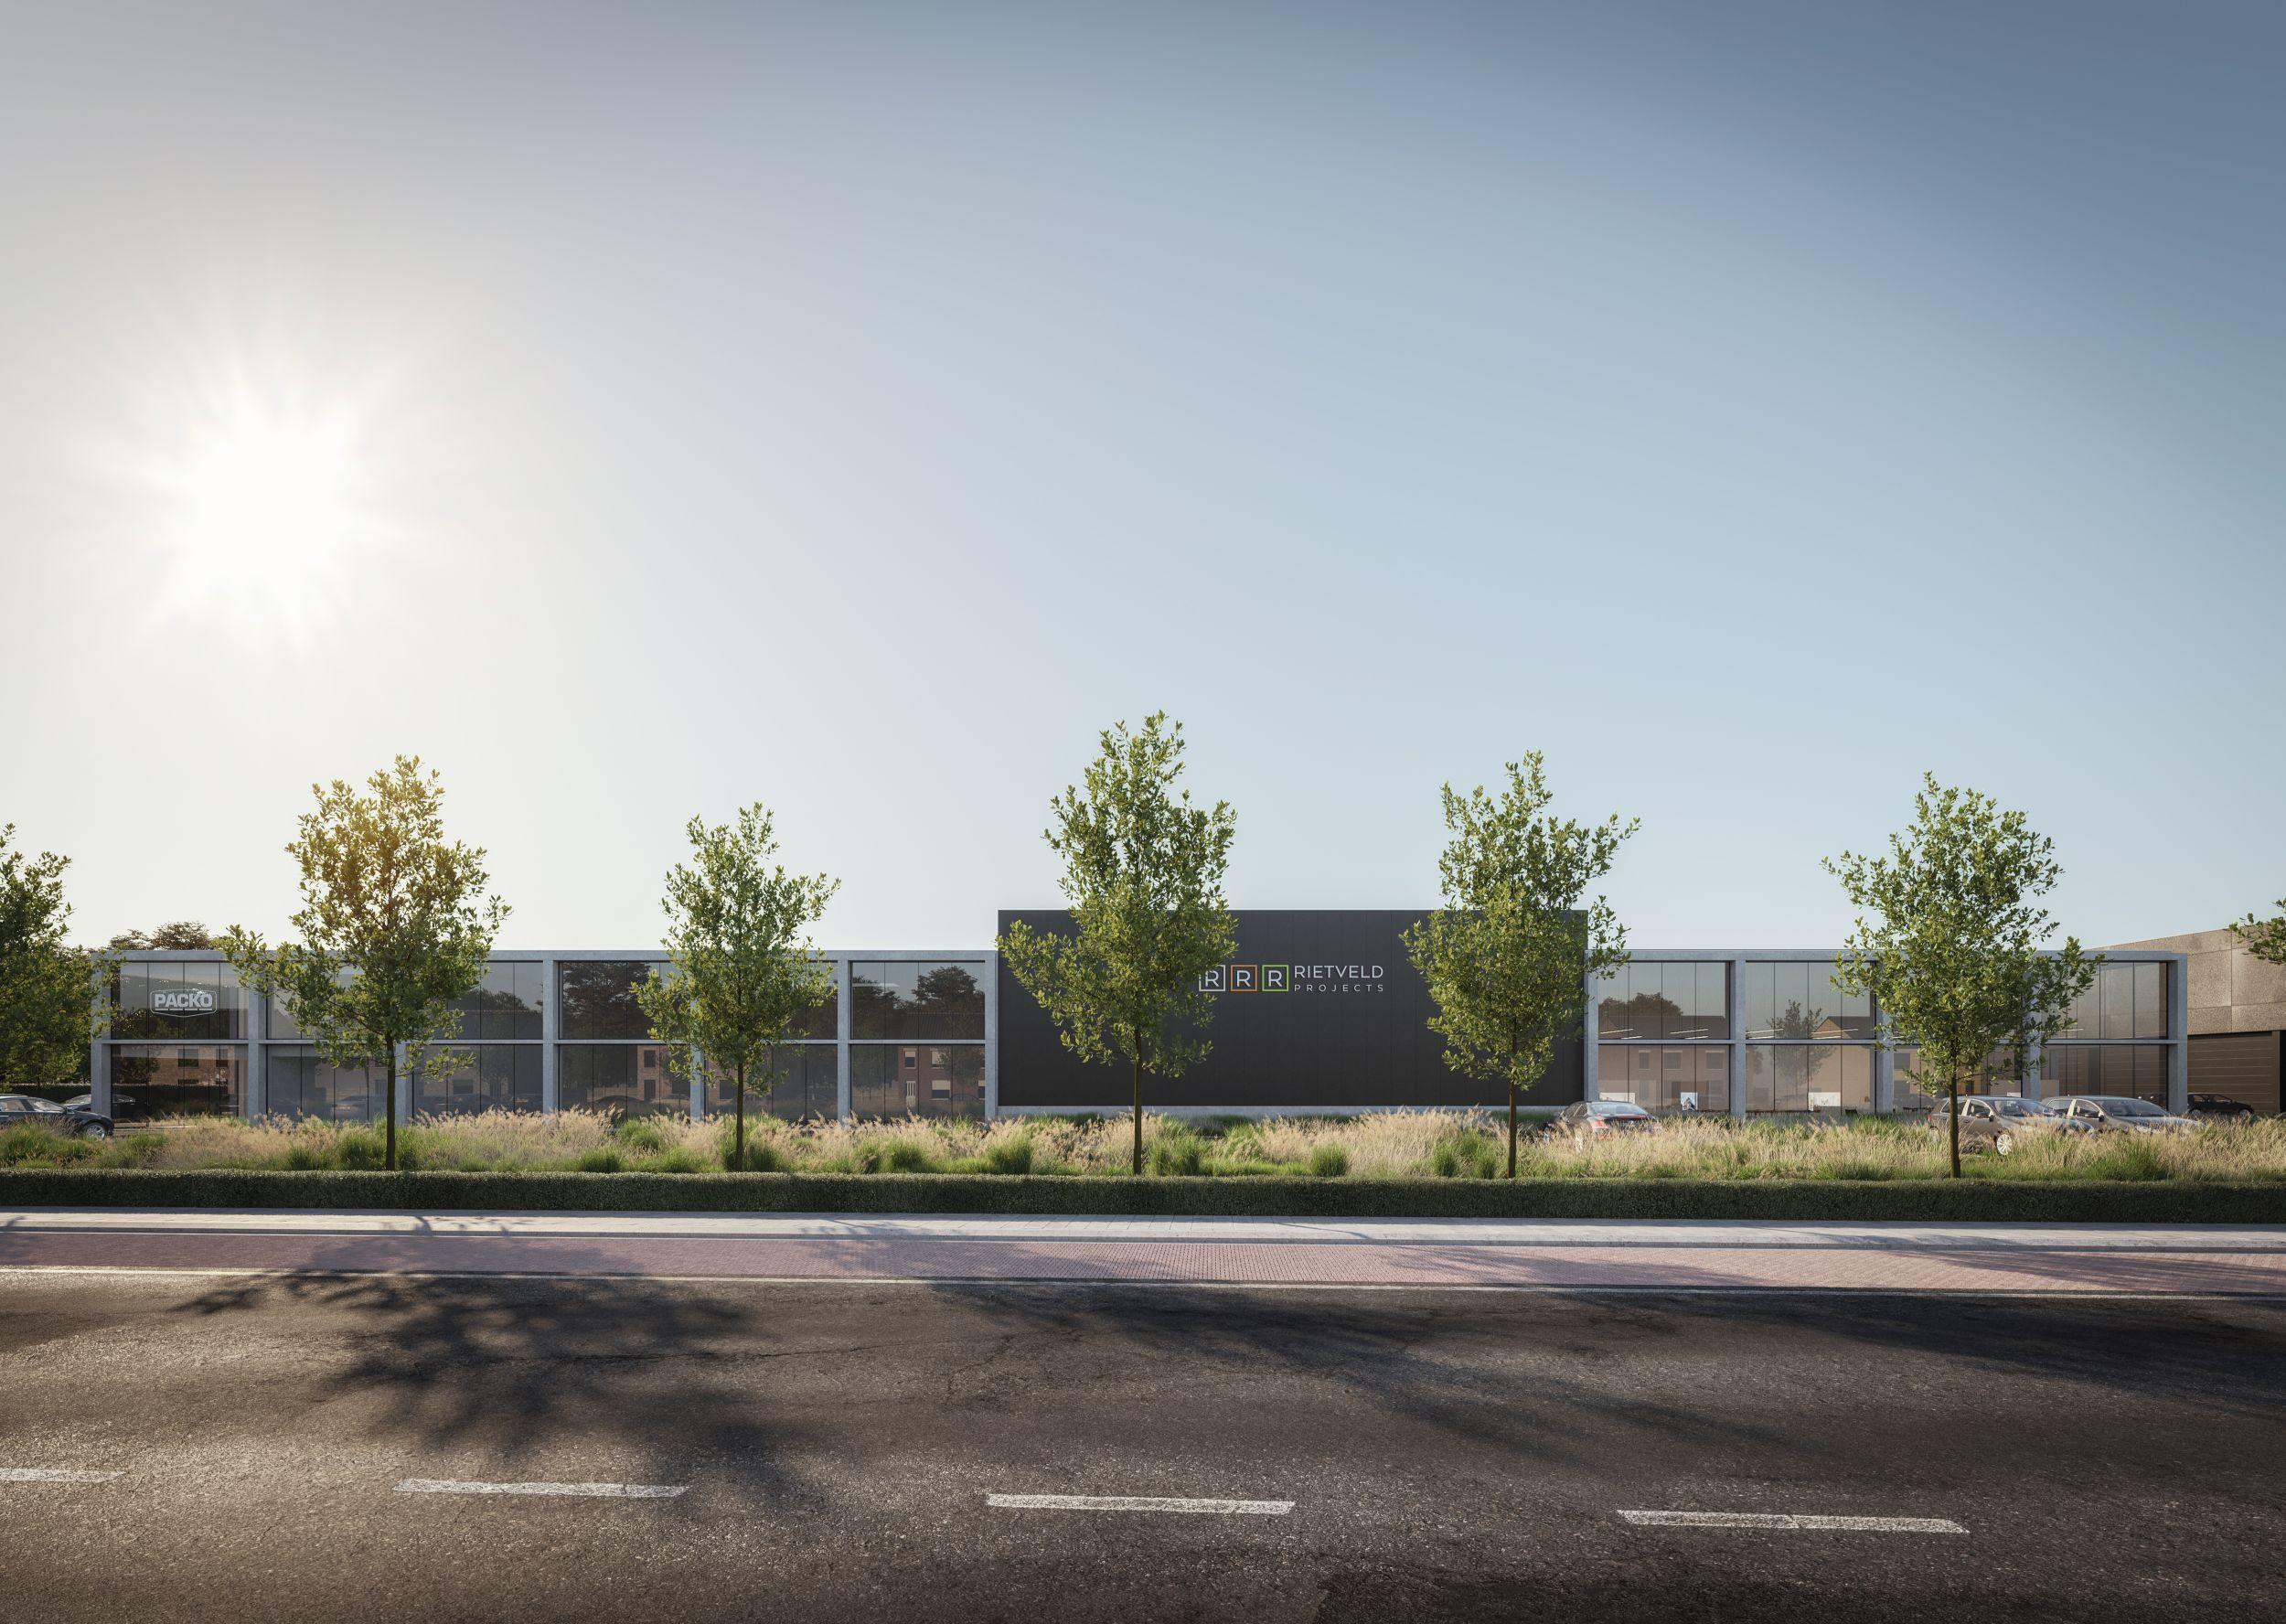 Rietveld Warehouses - Zedelgem Kuilputstraat 3.jpg